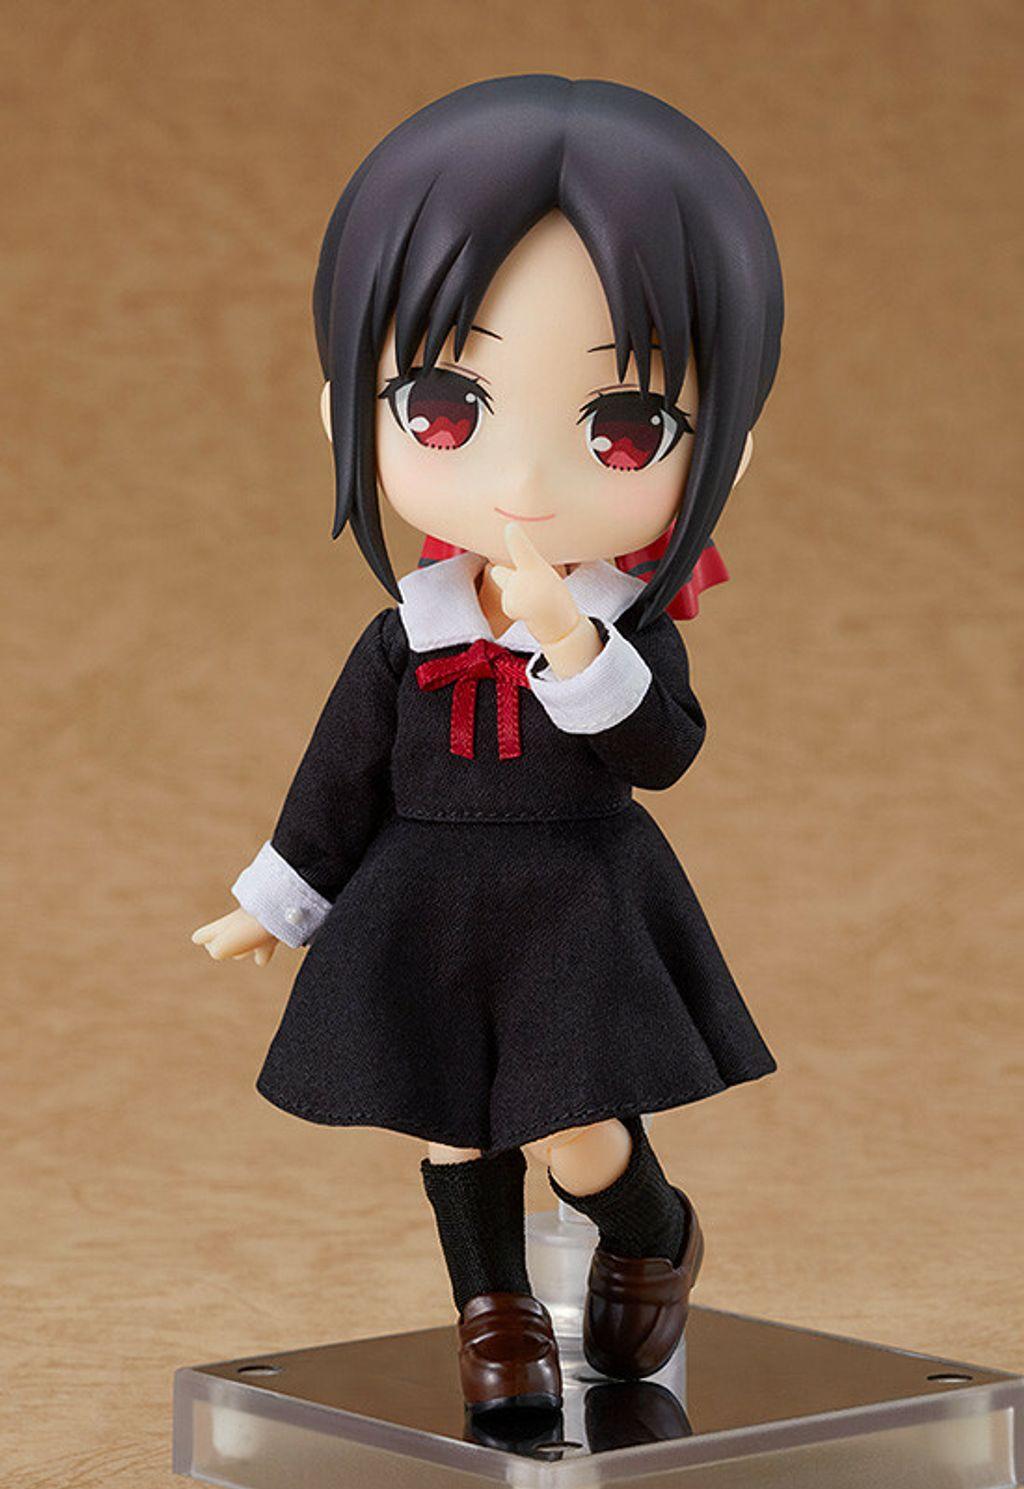 Nendoroid Doll Kaguya Shinomiya.jpg